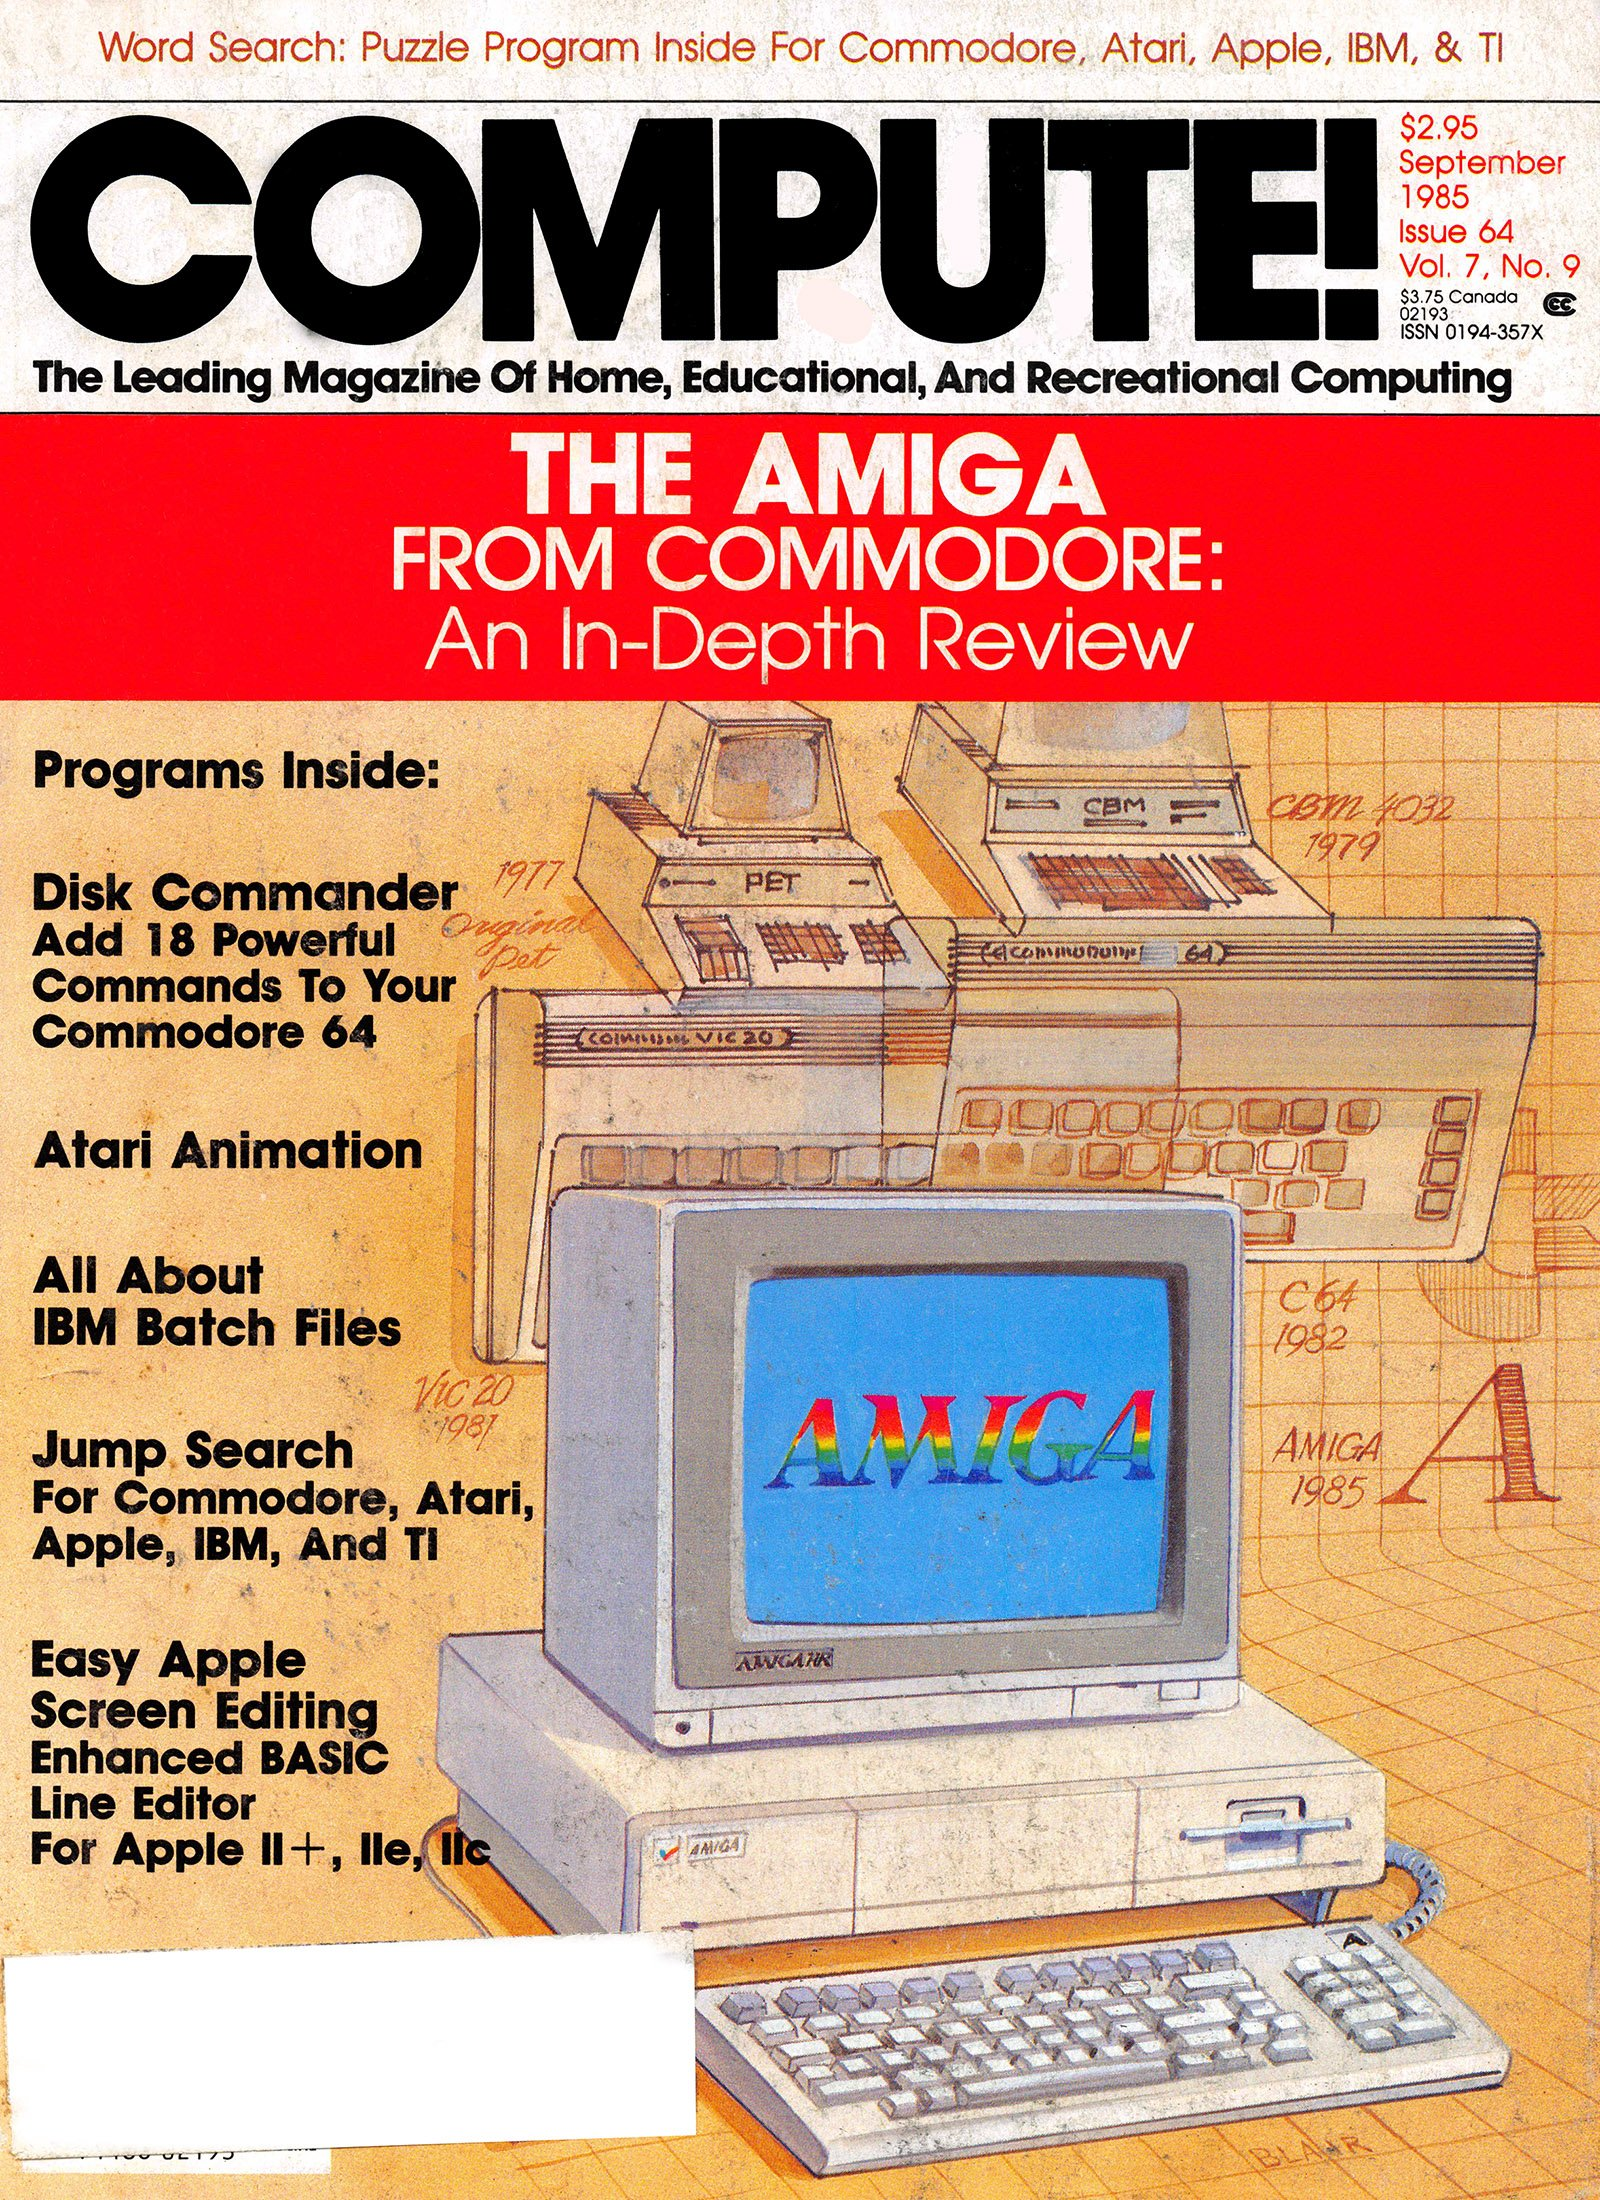 Compute! Issue 064 Vol. 7, No. 9 September 1985